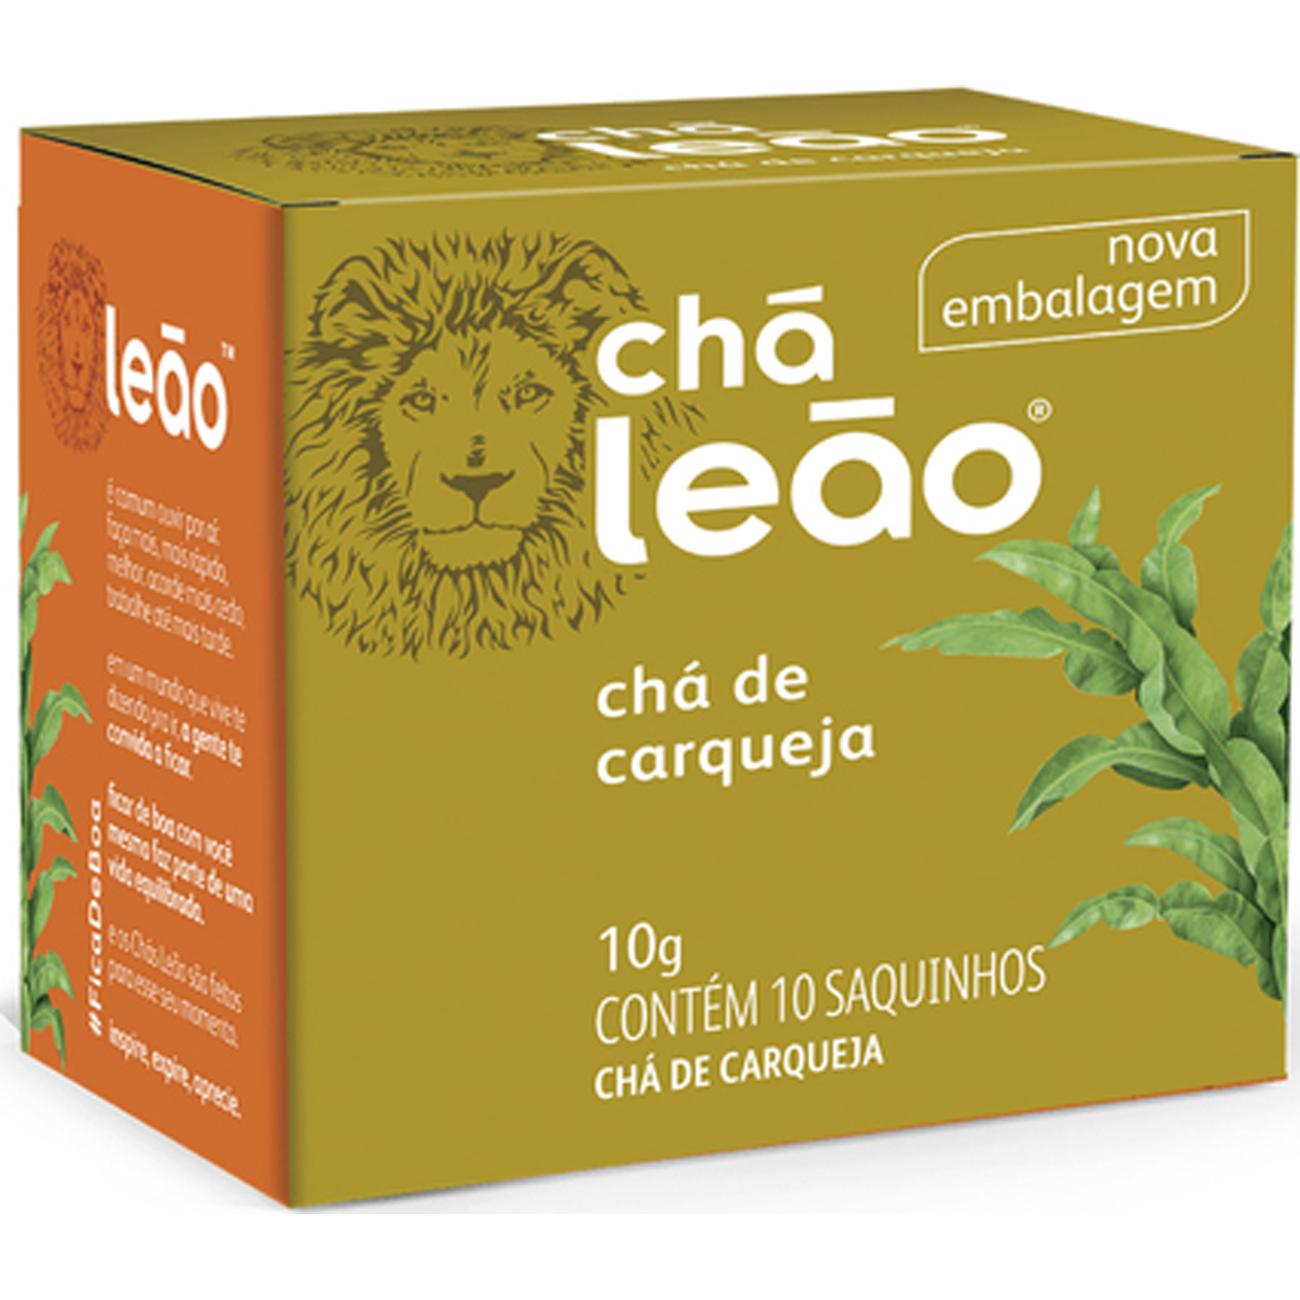 Cha Leao Carqueja 10 Saches